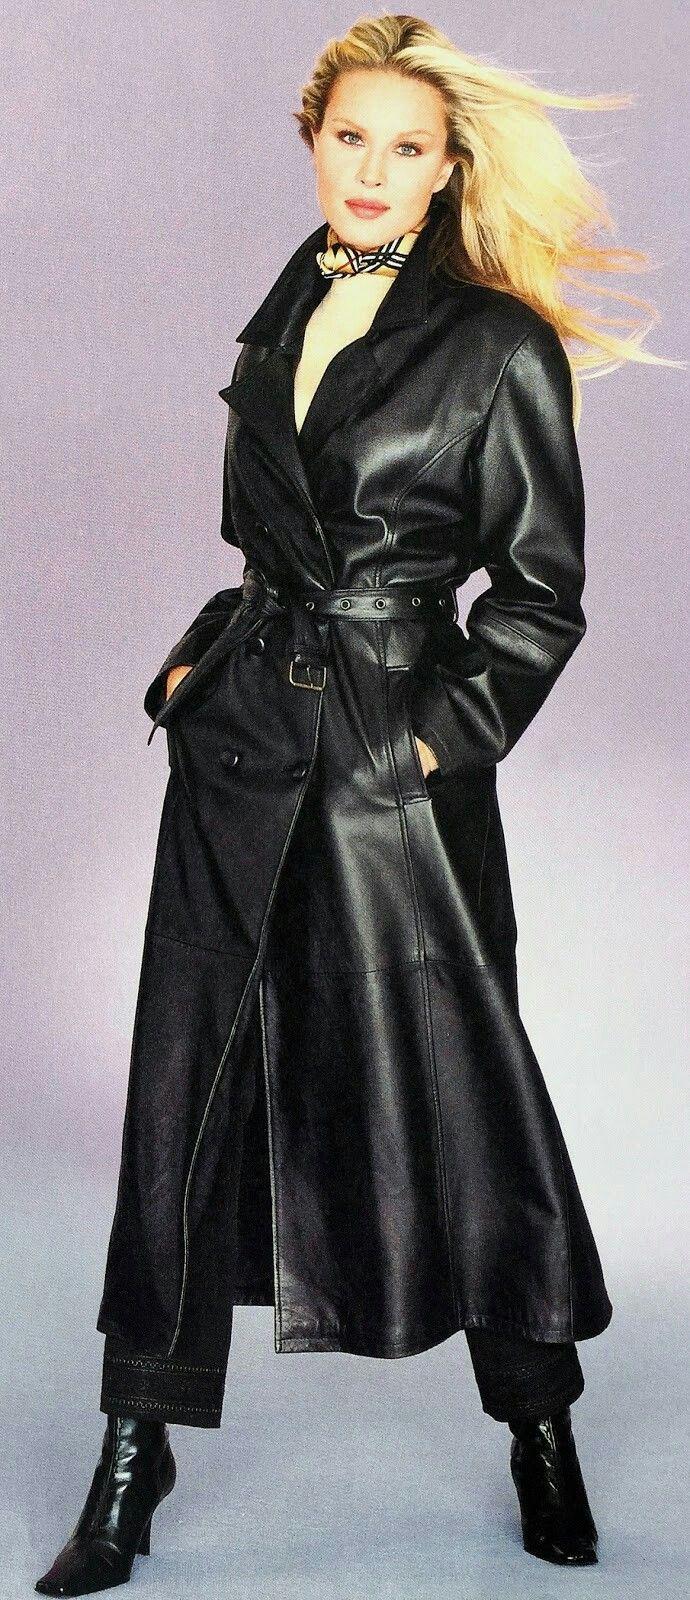 Lederlady Trench Coats Women Long Leather Coat Leather Dresses [ 1600 x 690 Pixel ]